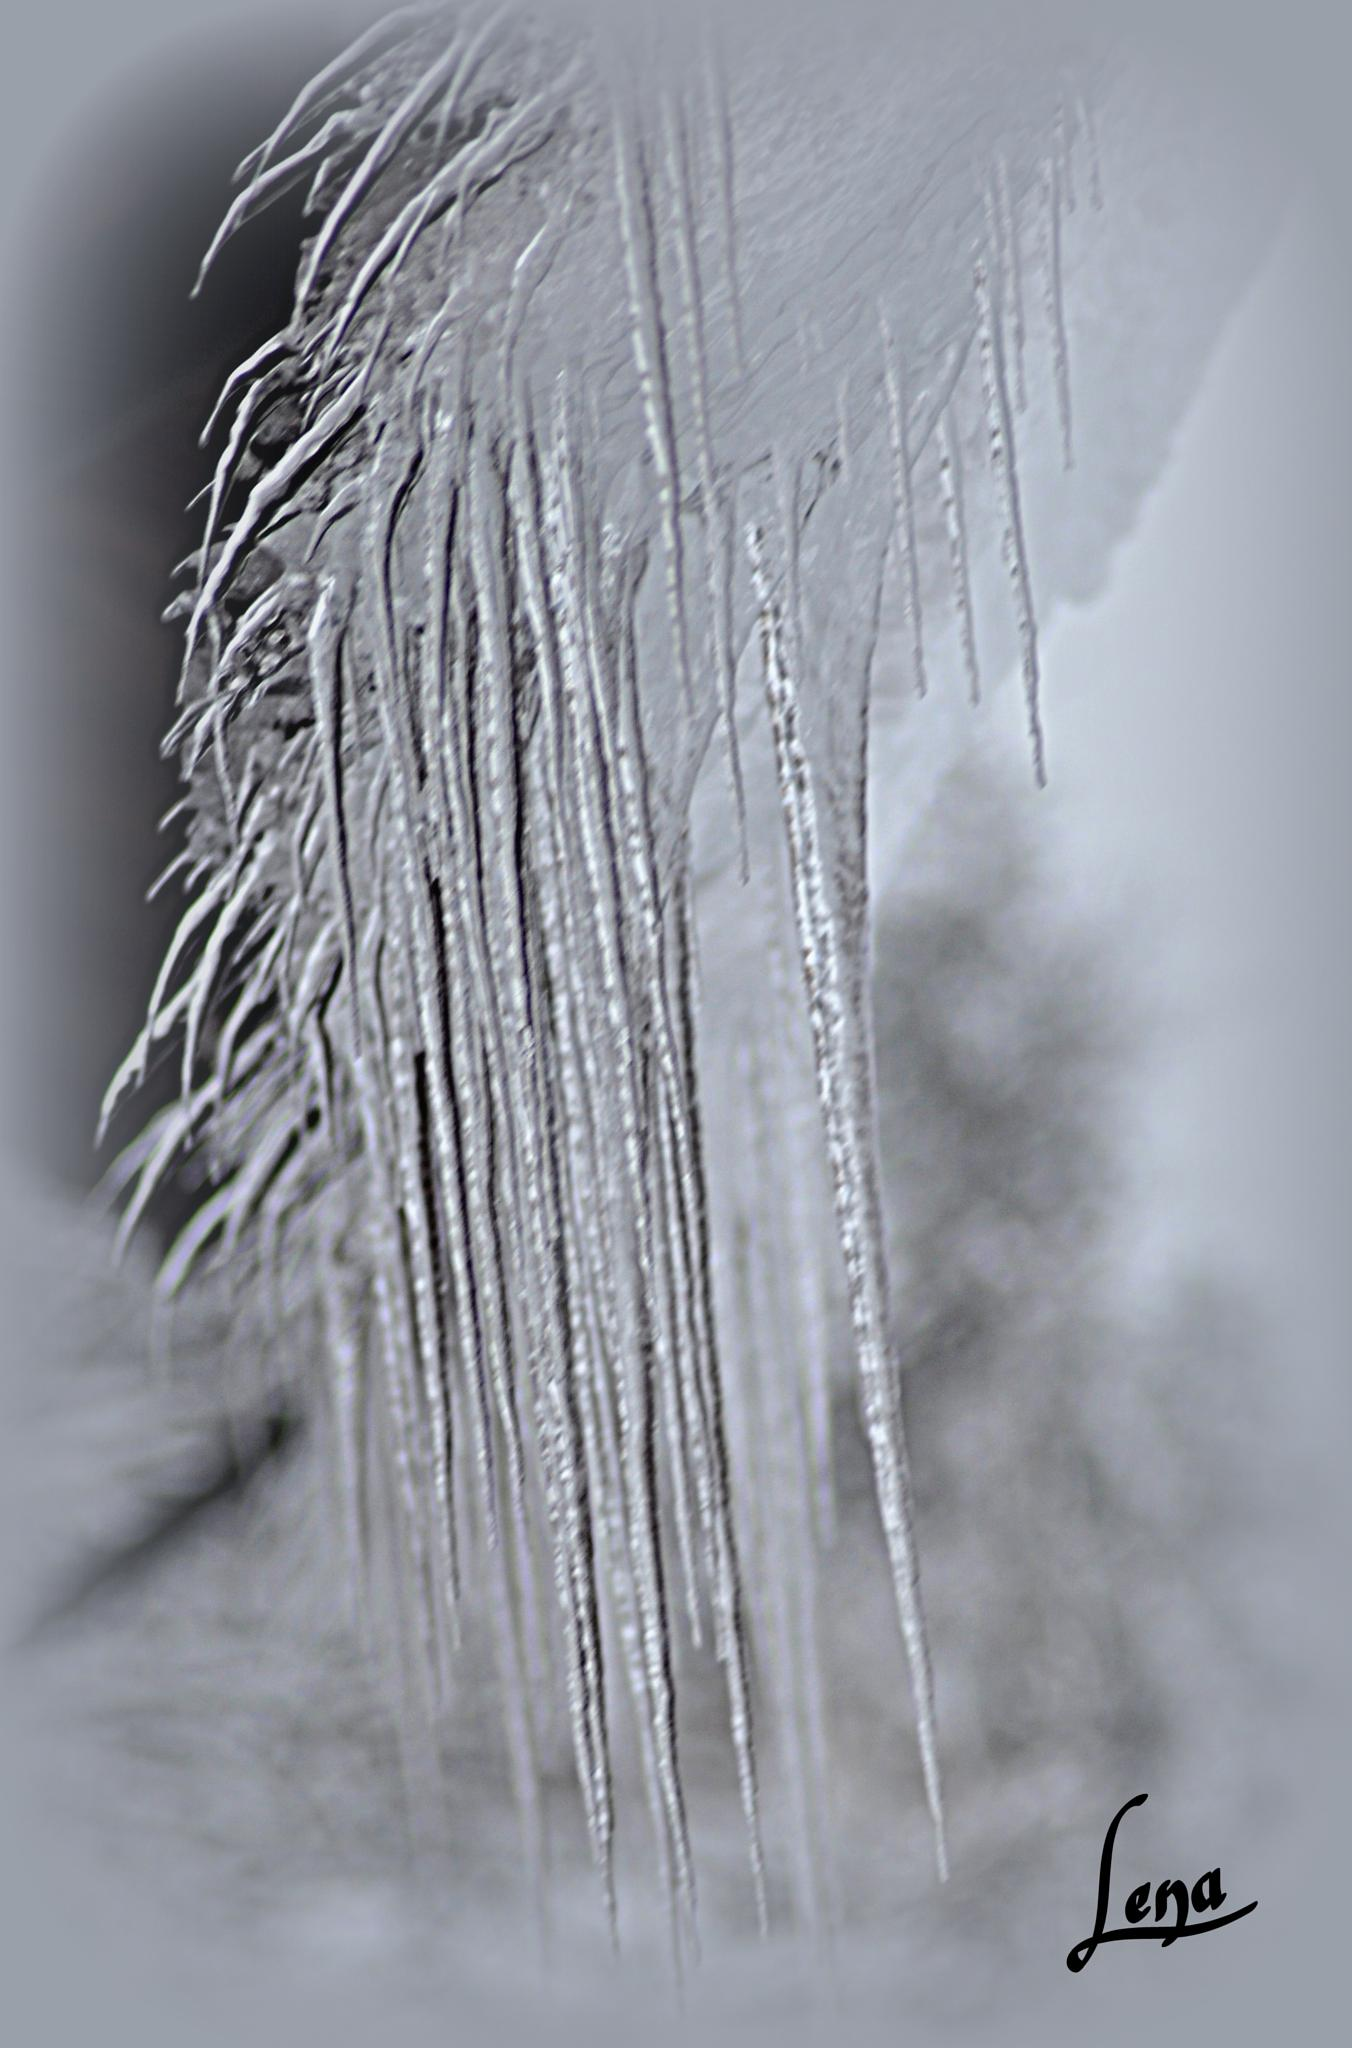 Ice  by Lena